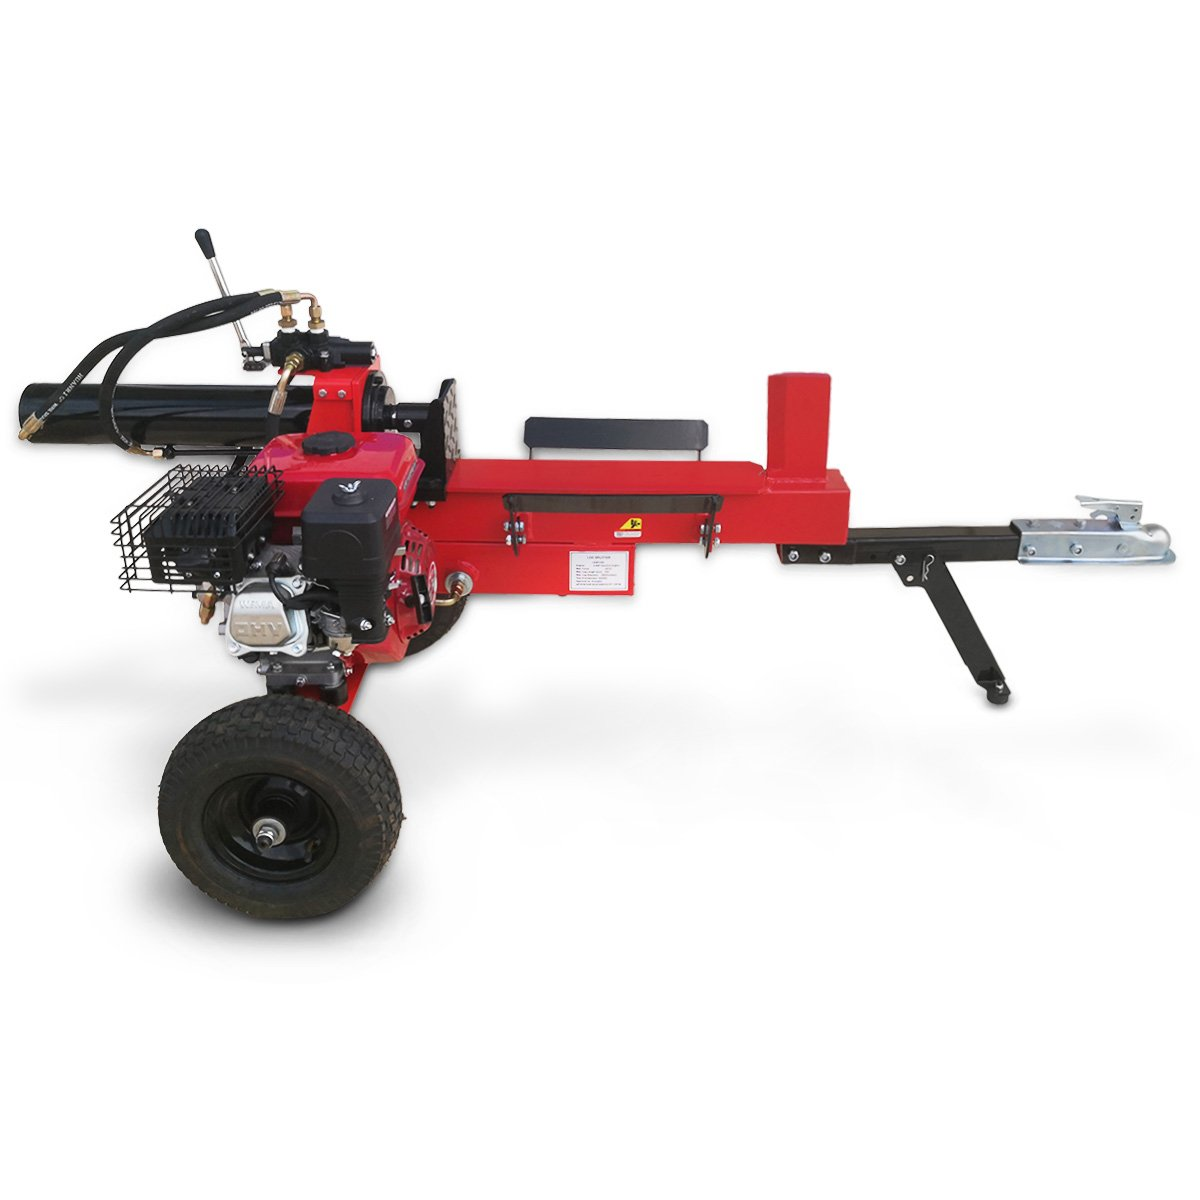 Ducar Petrol Log Splitter Wood Cutter - 20Ton - $1481.2